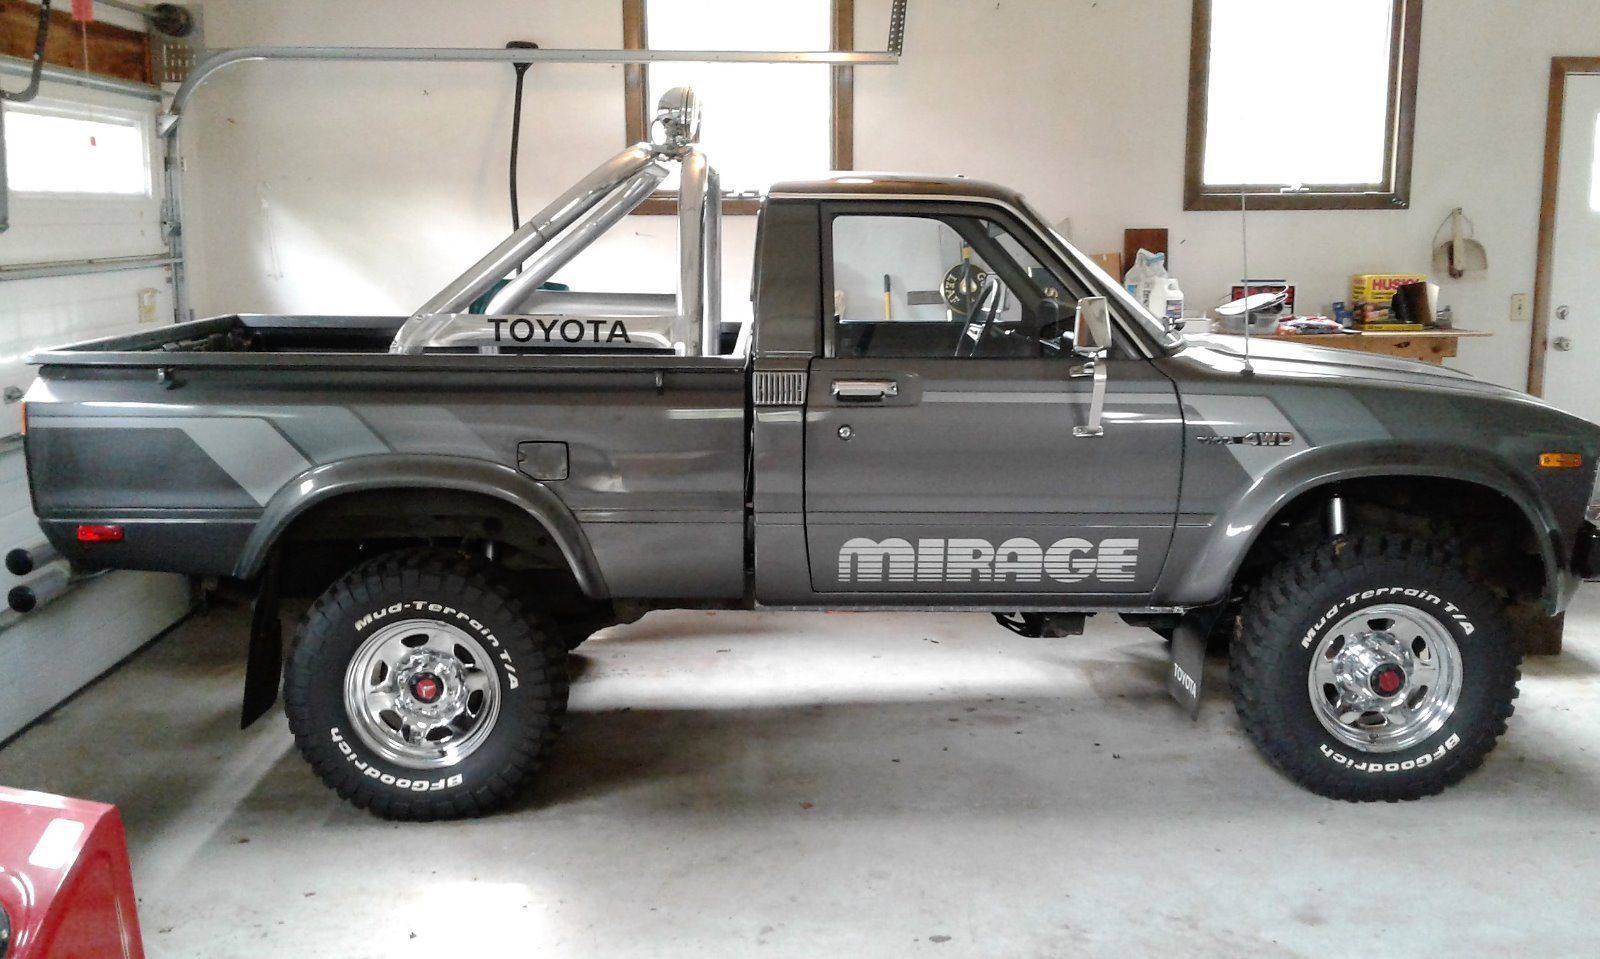 hight resolution of 1983 toyota sr 5 4x4 pickup truck mirage limited edition 1983 toyota hilux 4x4 pickup truck mirage edition the toyota hilux tr